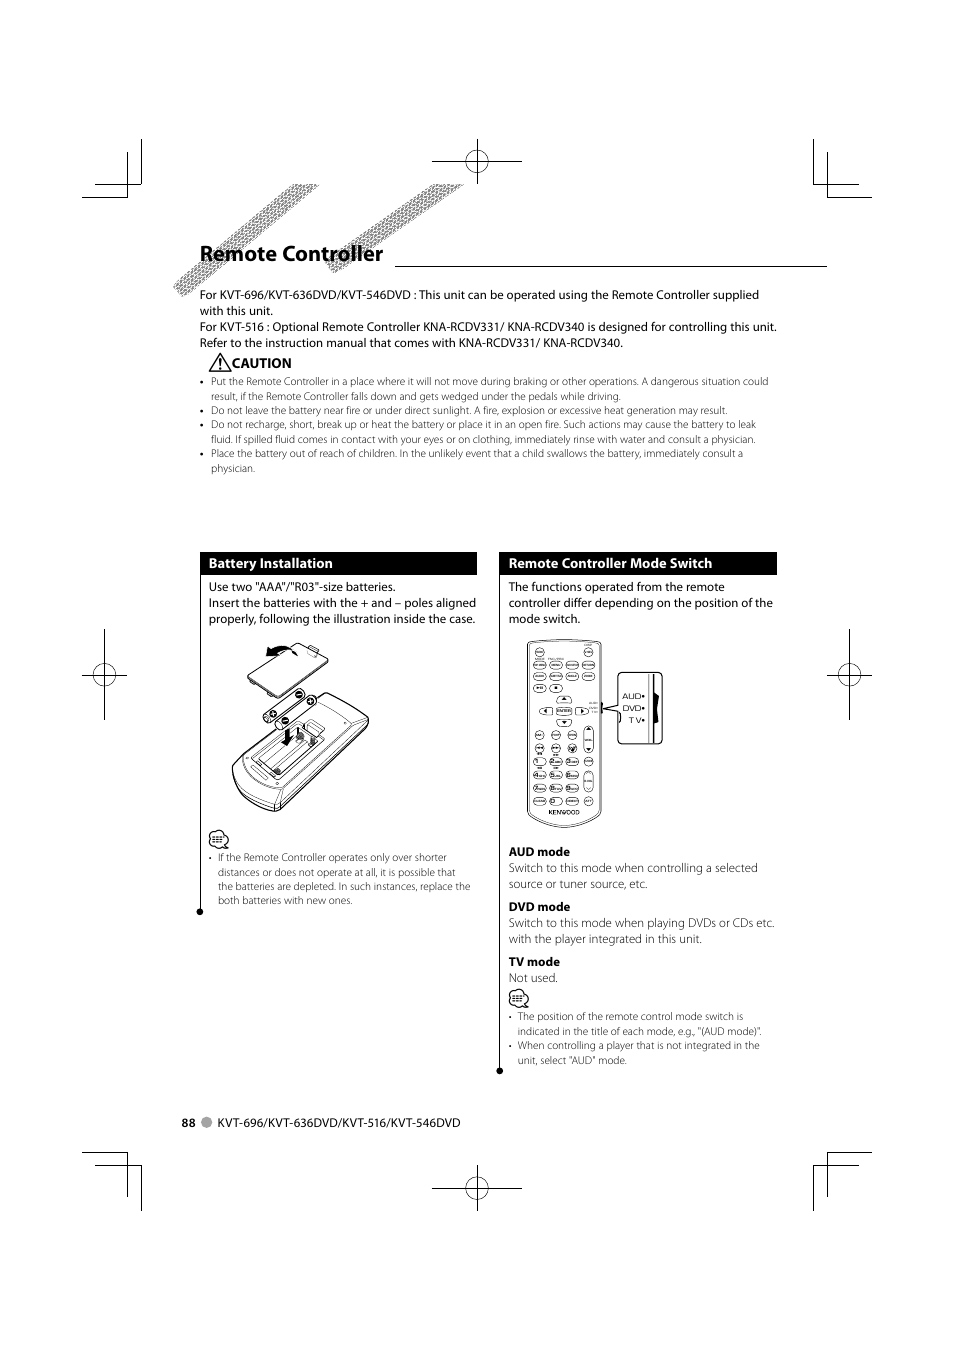 Kenwood kvt 516 wiring diagram page 5 wiring diagram and.